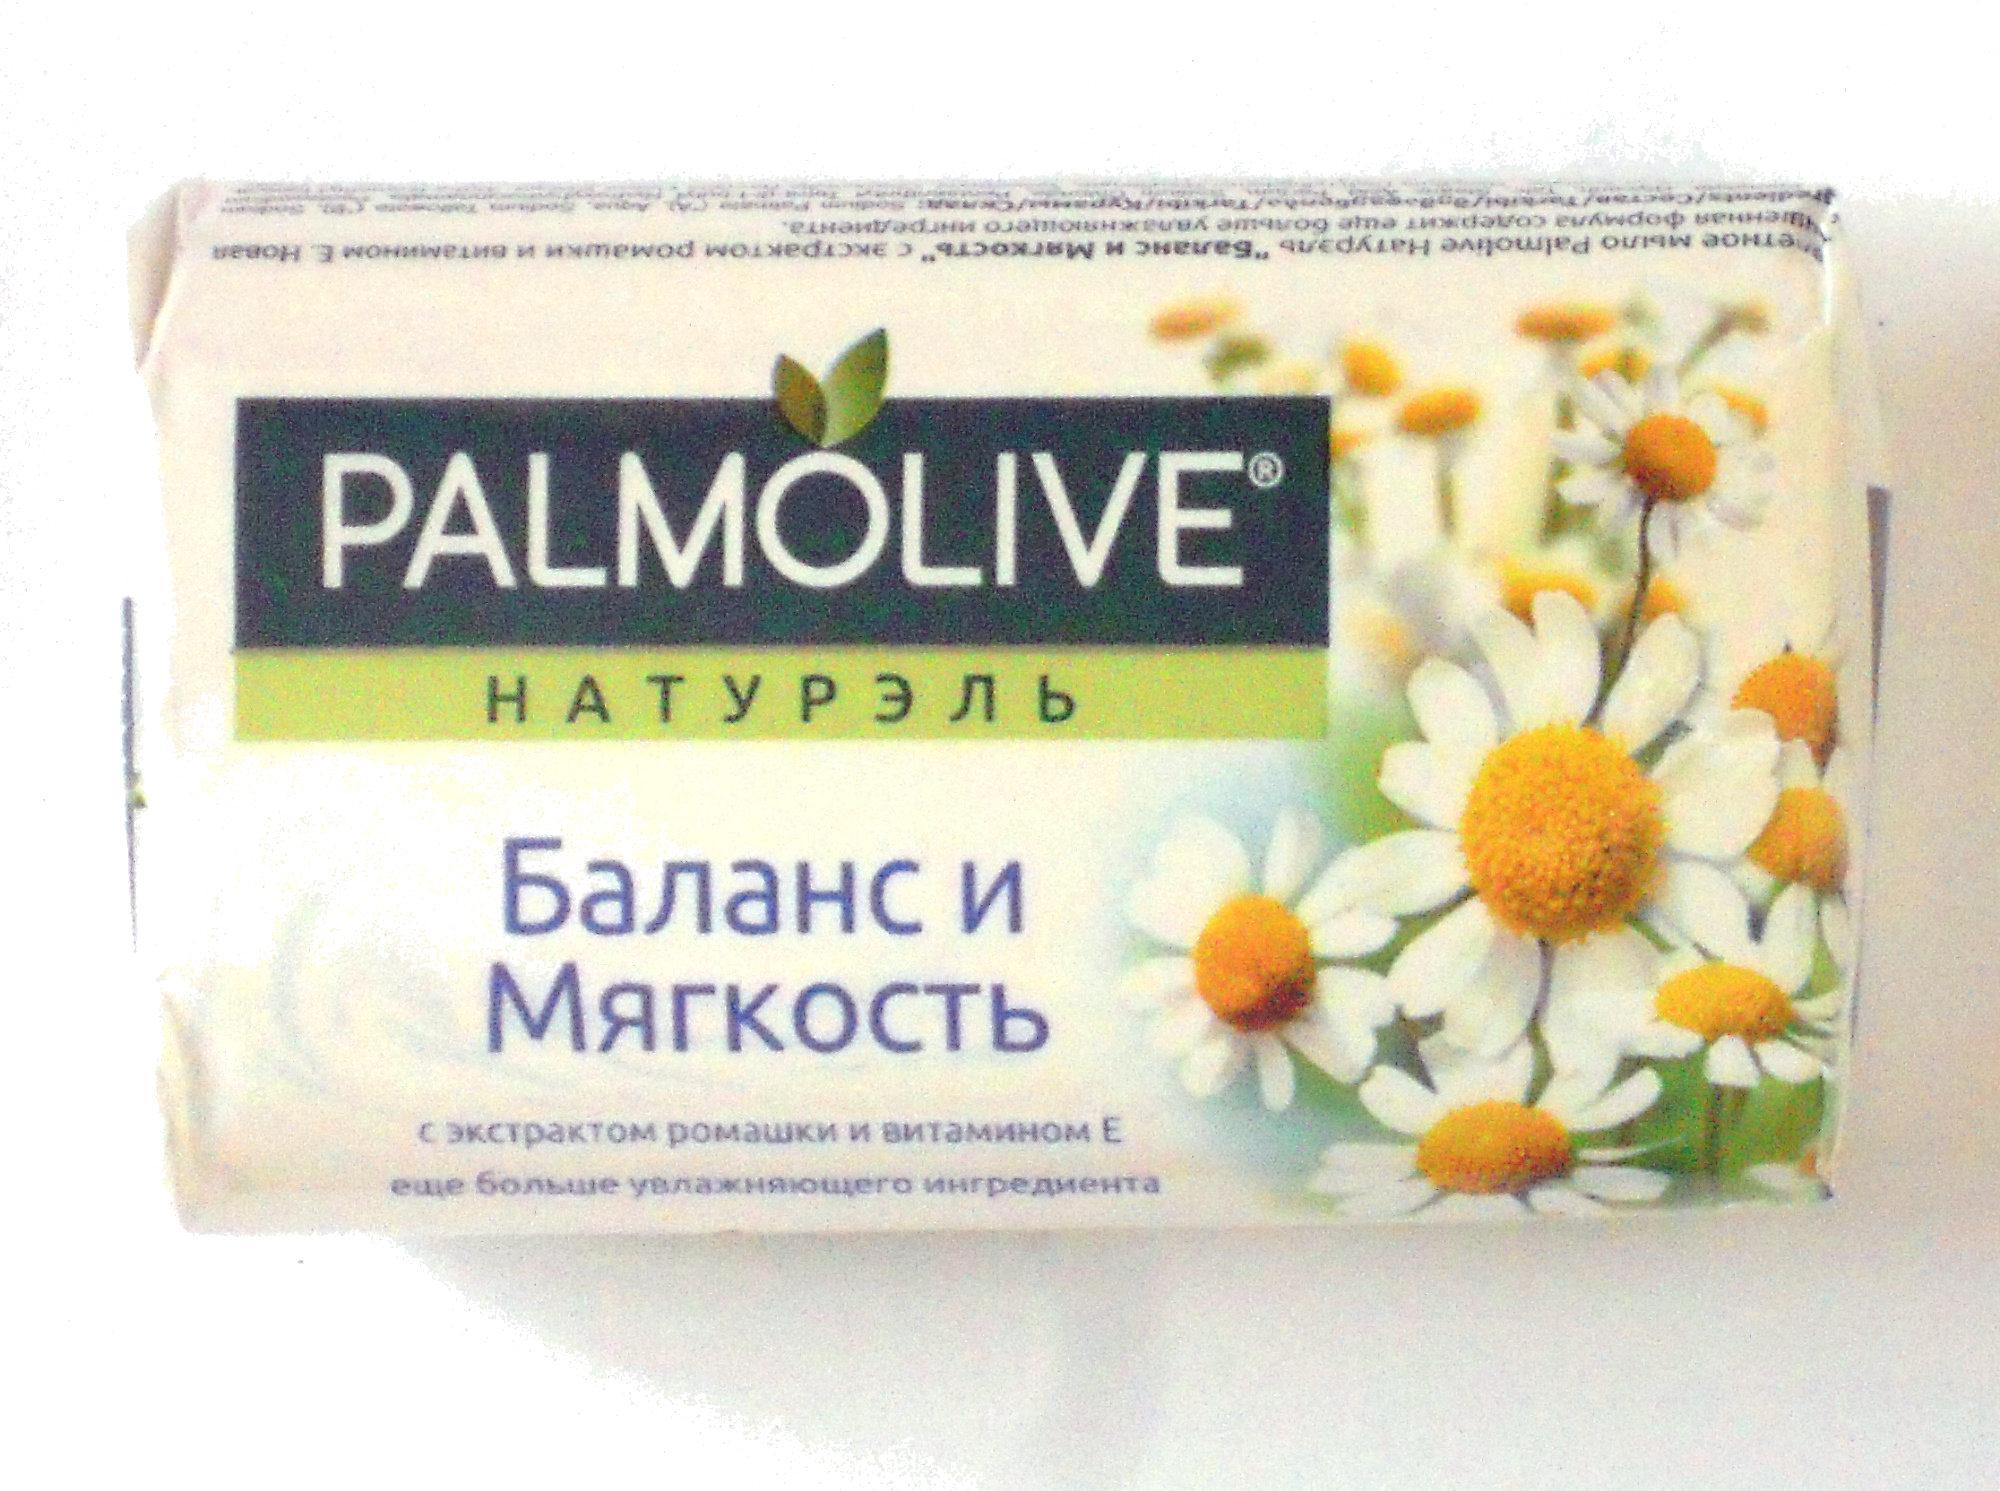 Баланс и мягкость - Product - ru